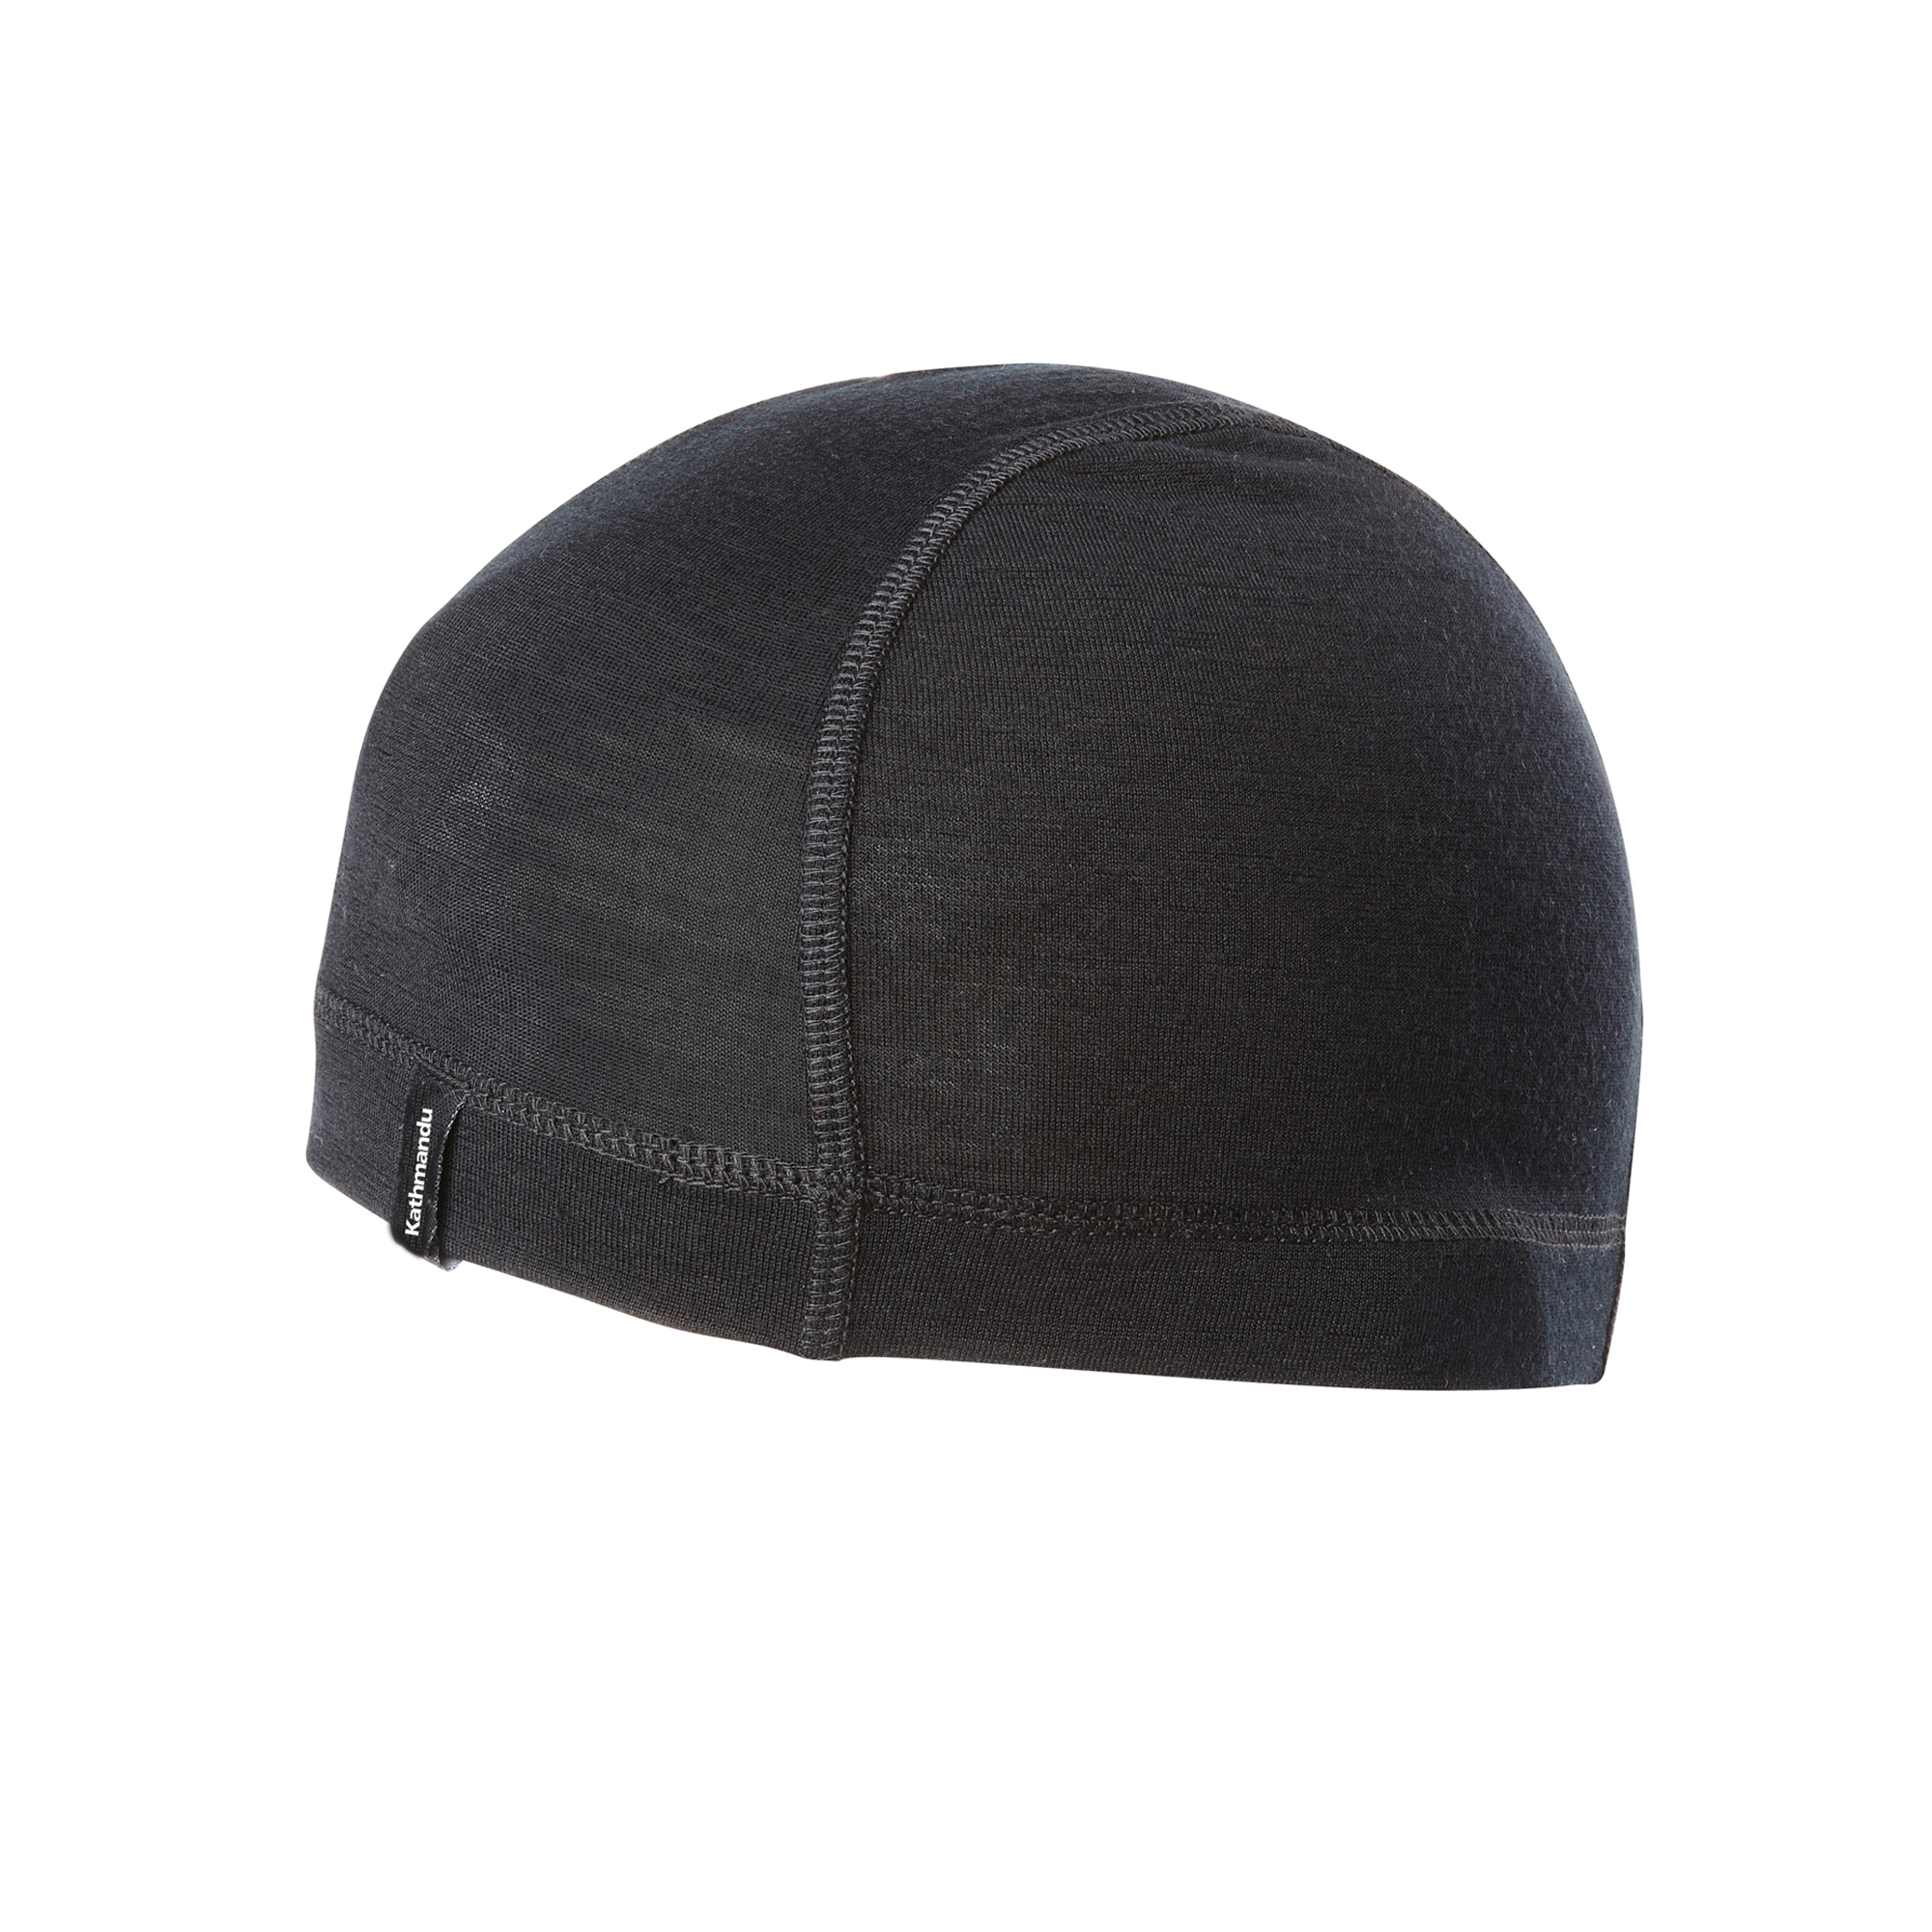 4d862491f Details about NEW Kathmandu Butte Women's Men's Merino Wool Comfortable  Warm Beanie Hat